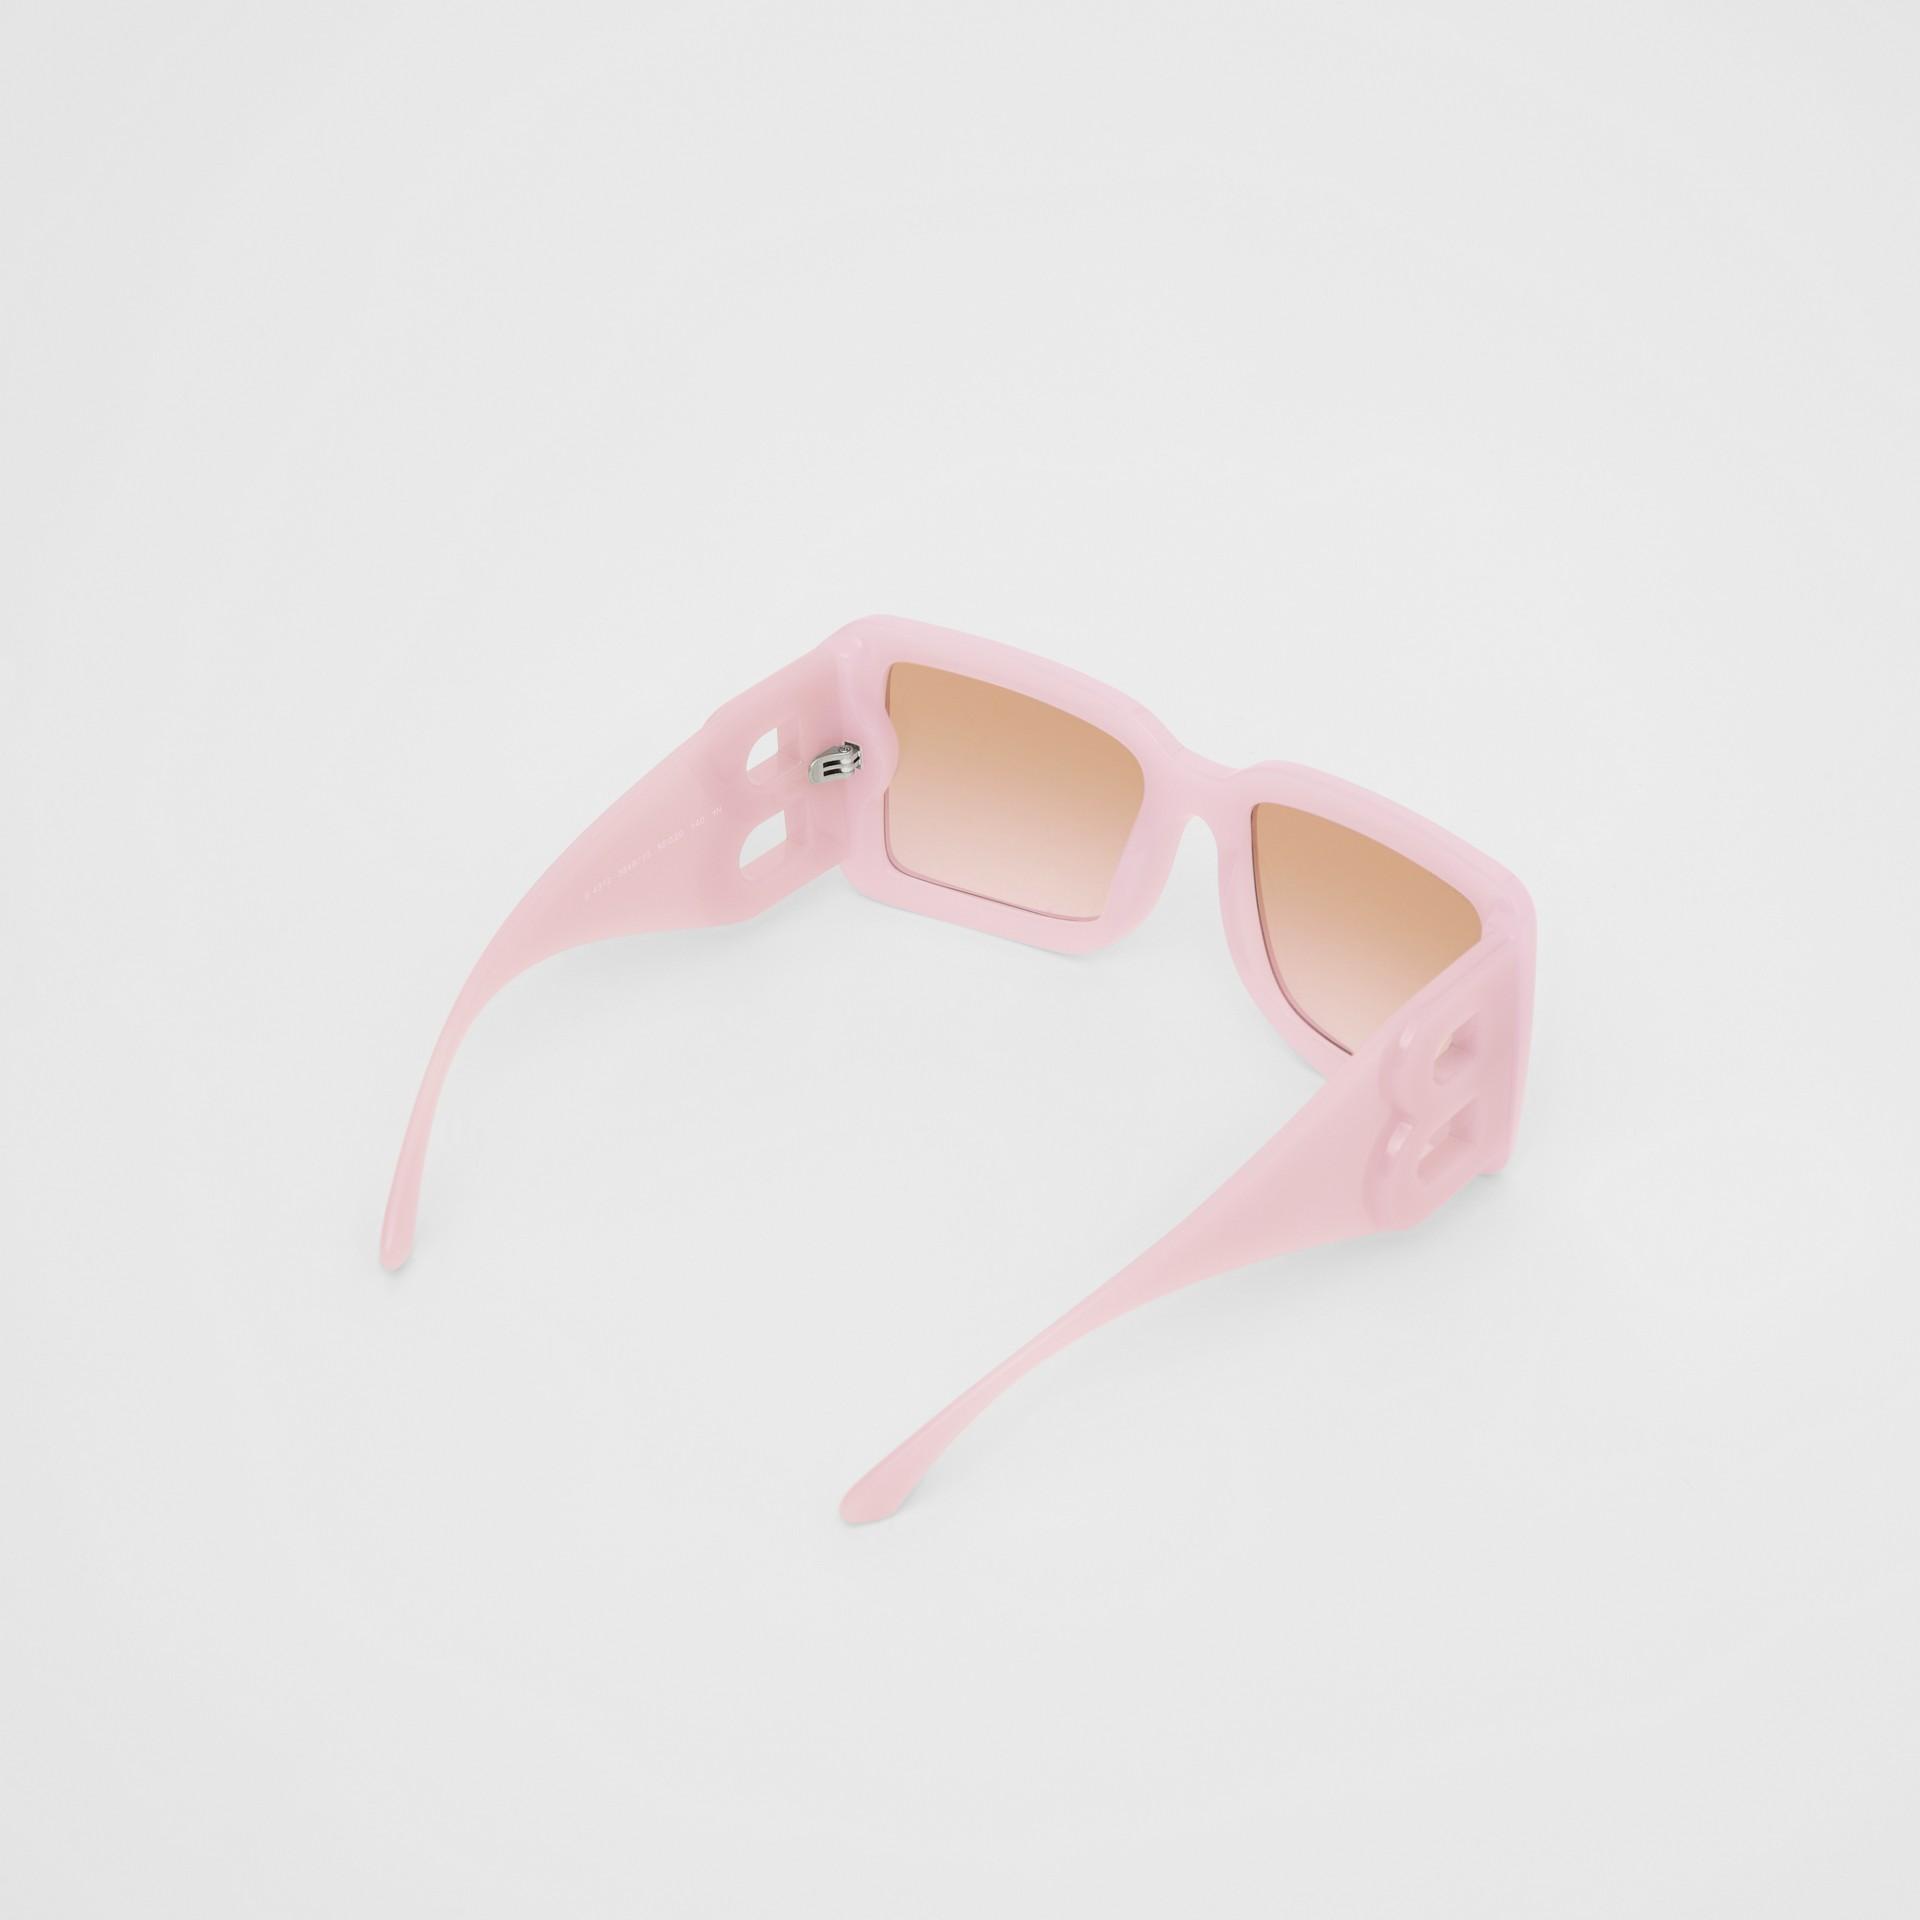 B Motif Square Frame Sunglasses in Lilac - Women | Burberry Australia - gallery image 4